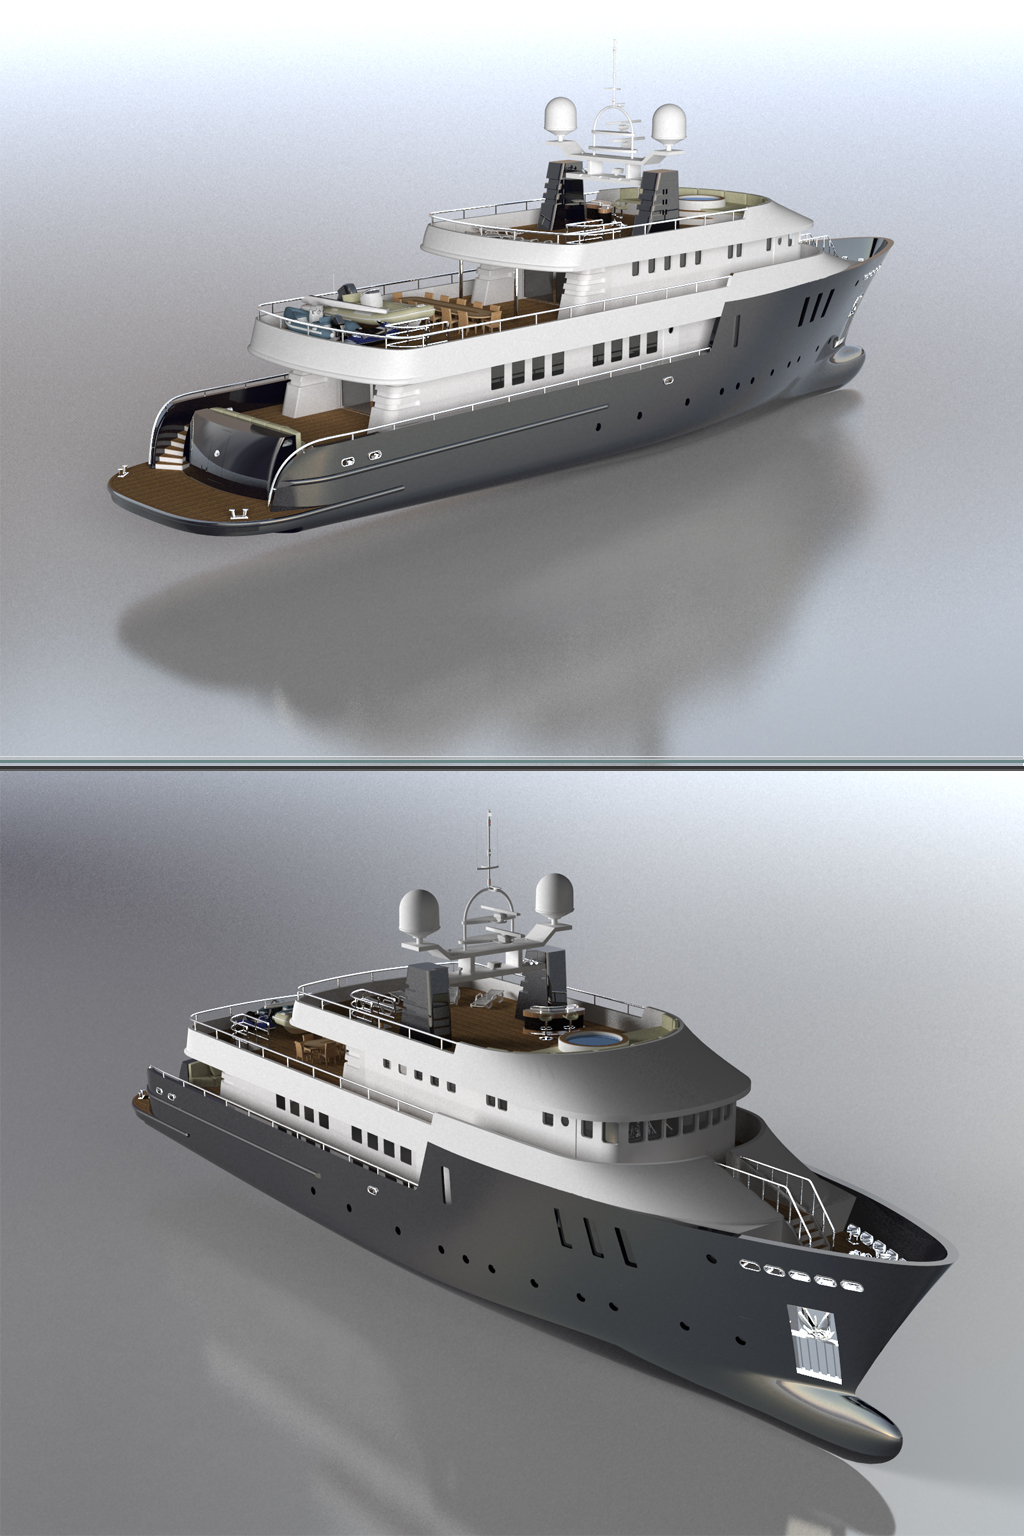 trawler yacht by pohorololo